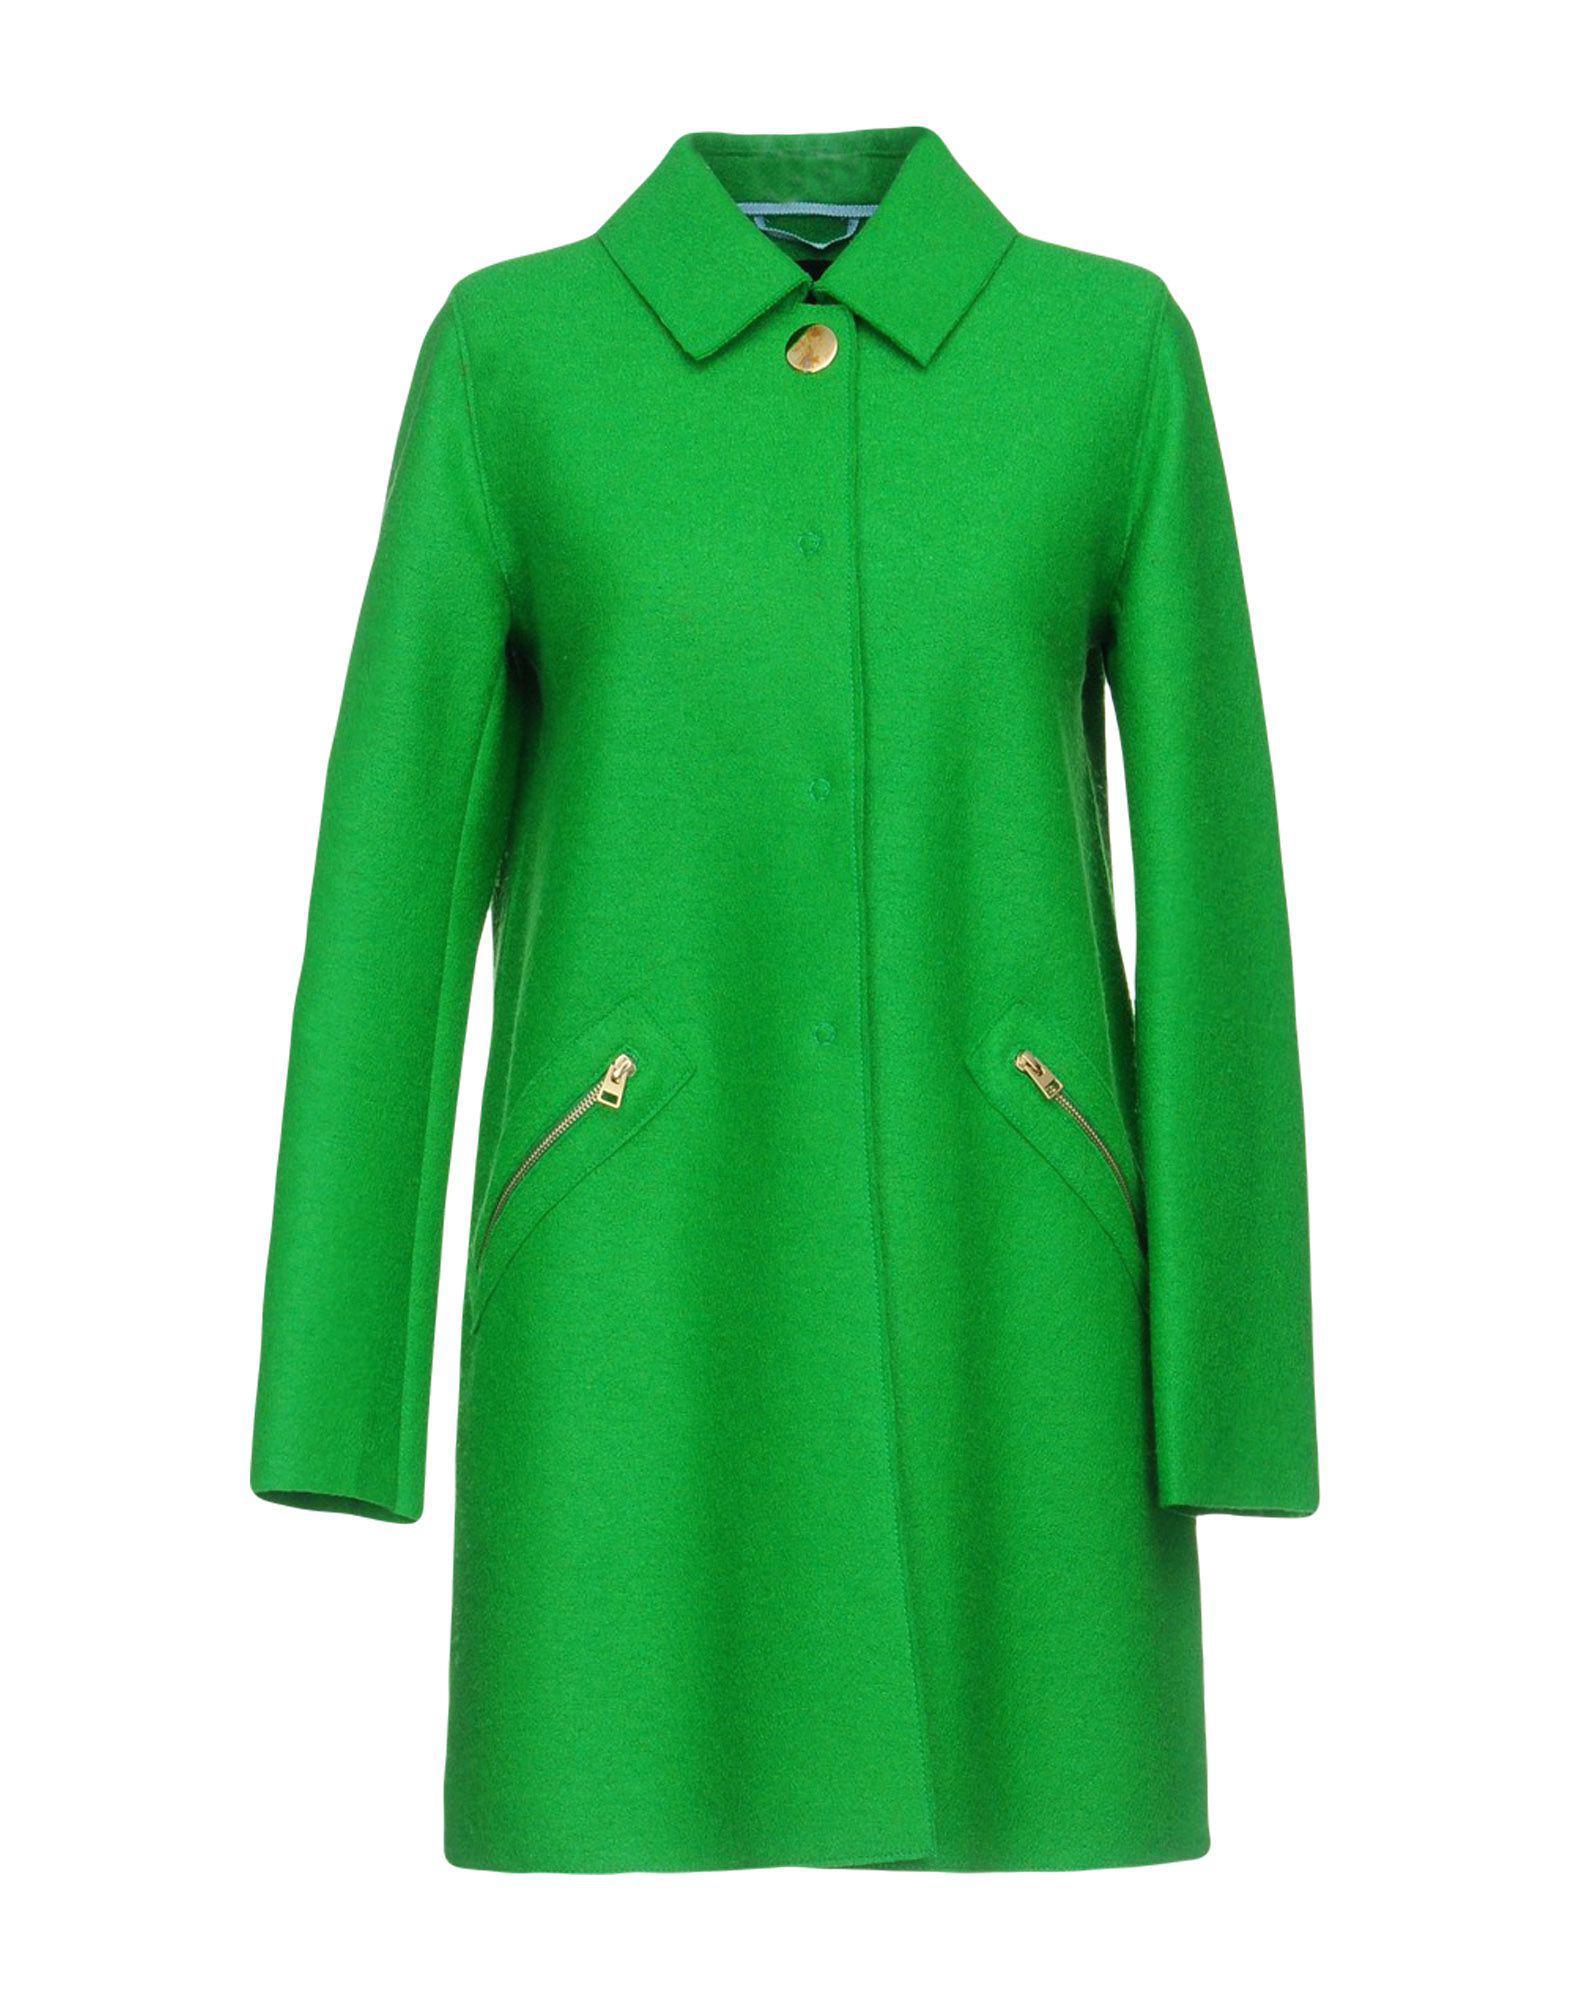 c6a2dc2a14 Tara Jarmon Coat in Green - Lyst